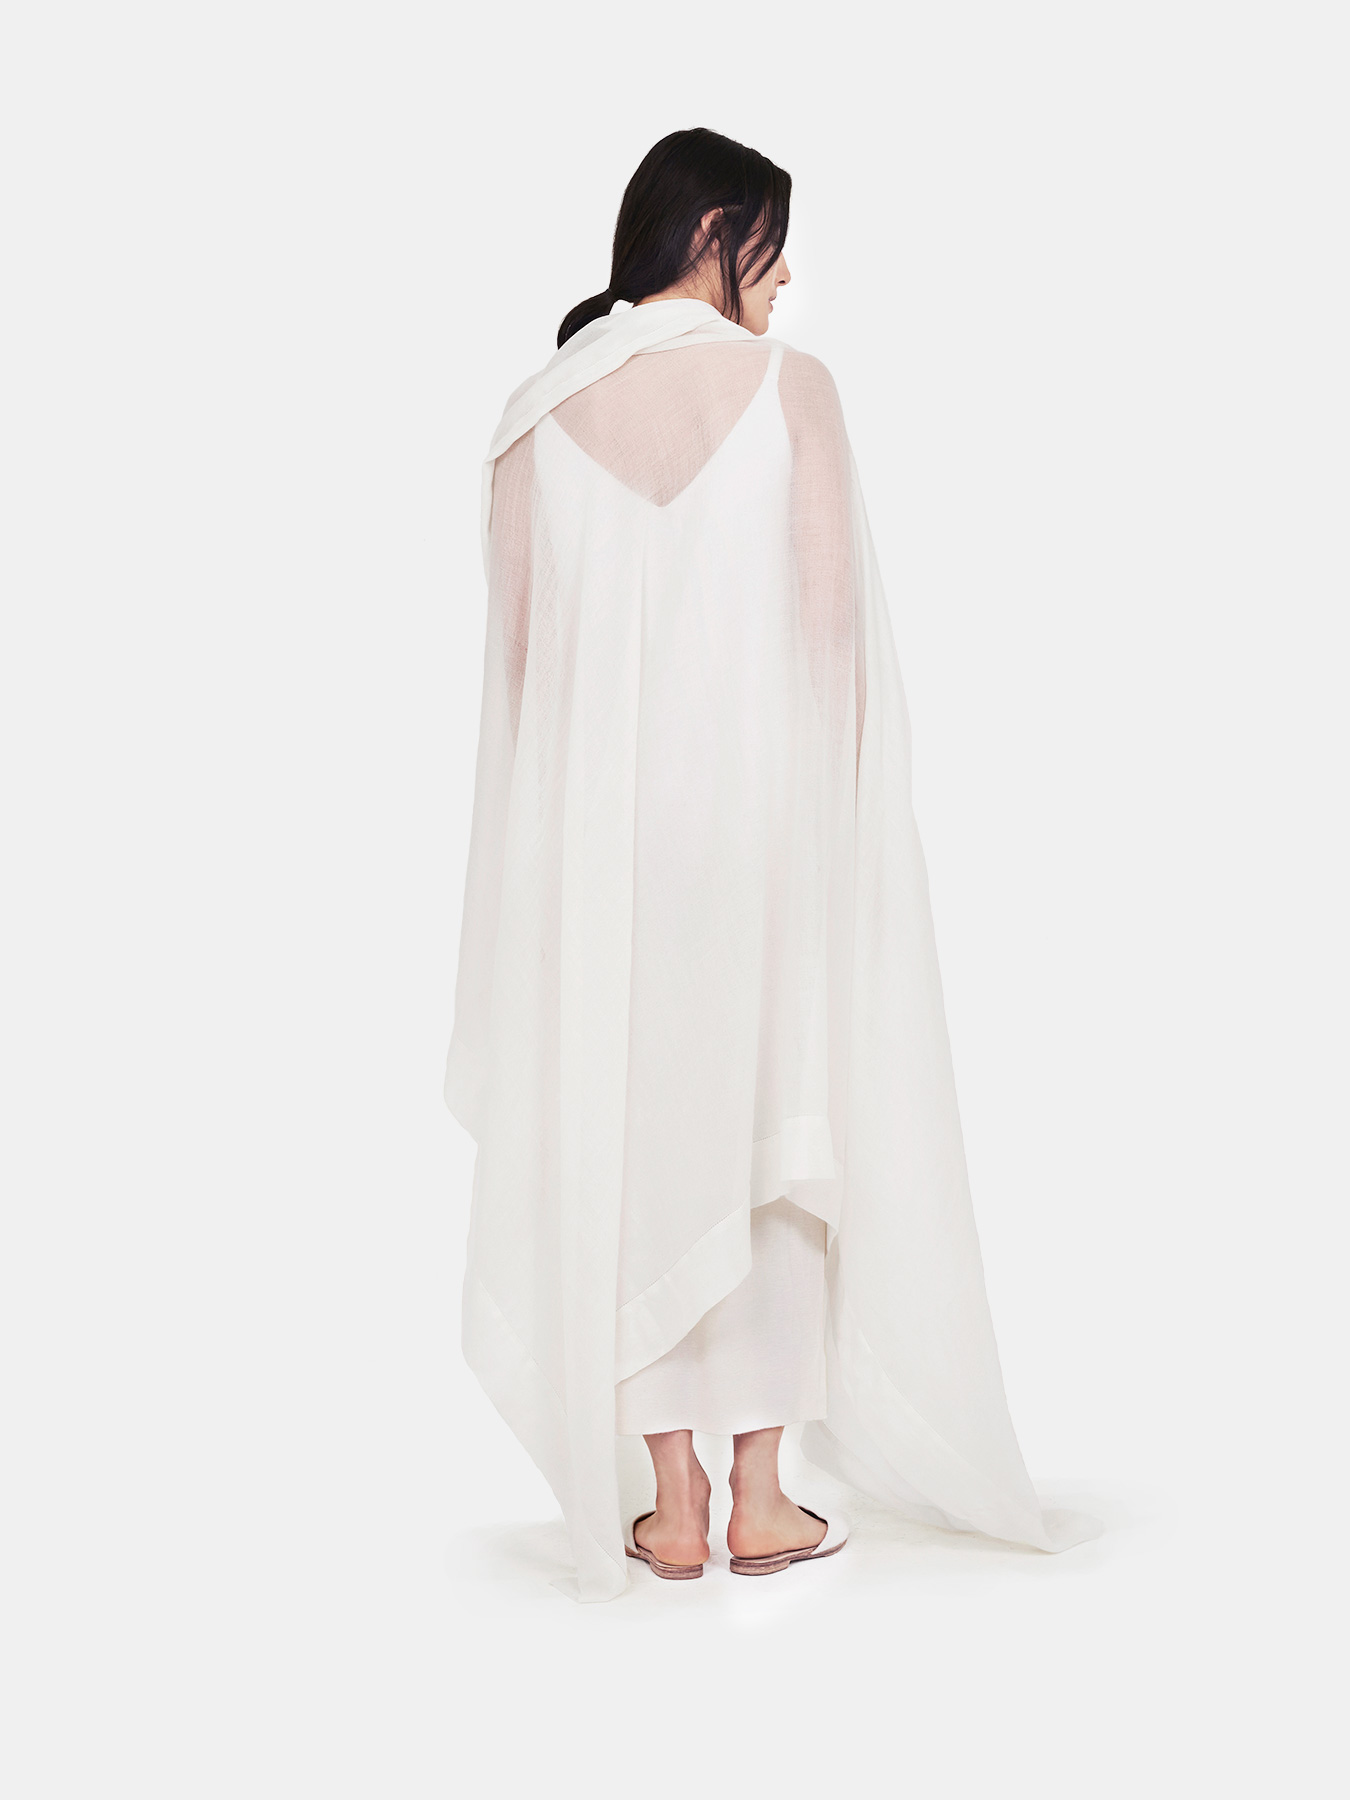 Feather-Cashmere-Wrap-Ivory-b.jpg